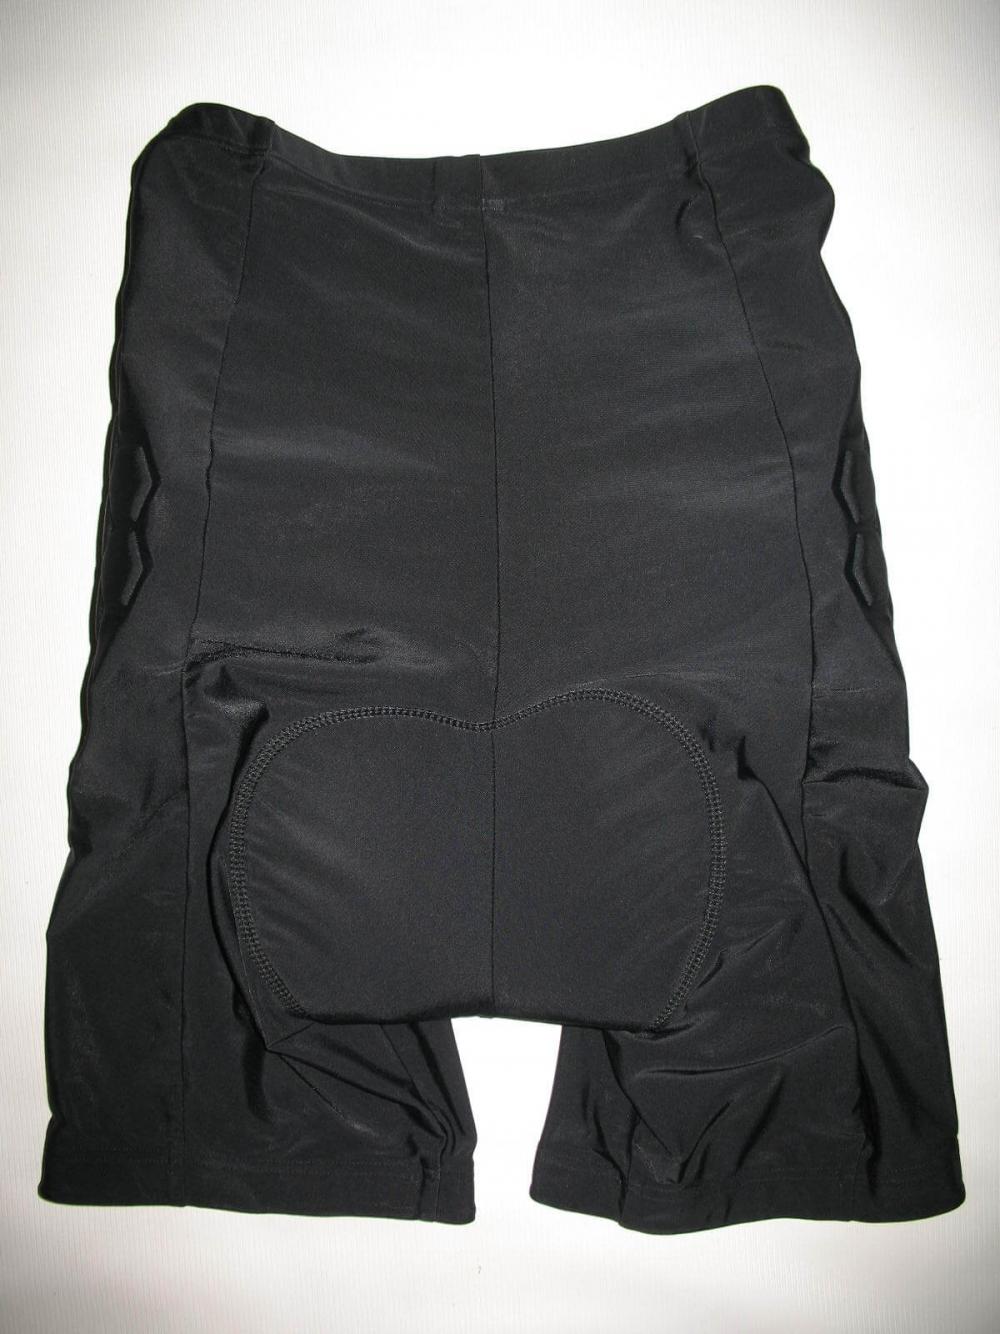 Велошорты ROCKRAIDER bike shorts (размер L) - 2